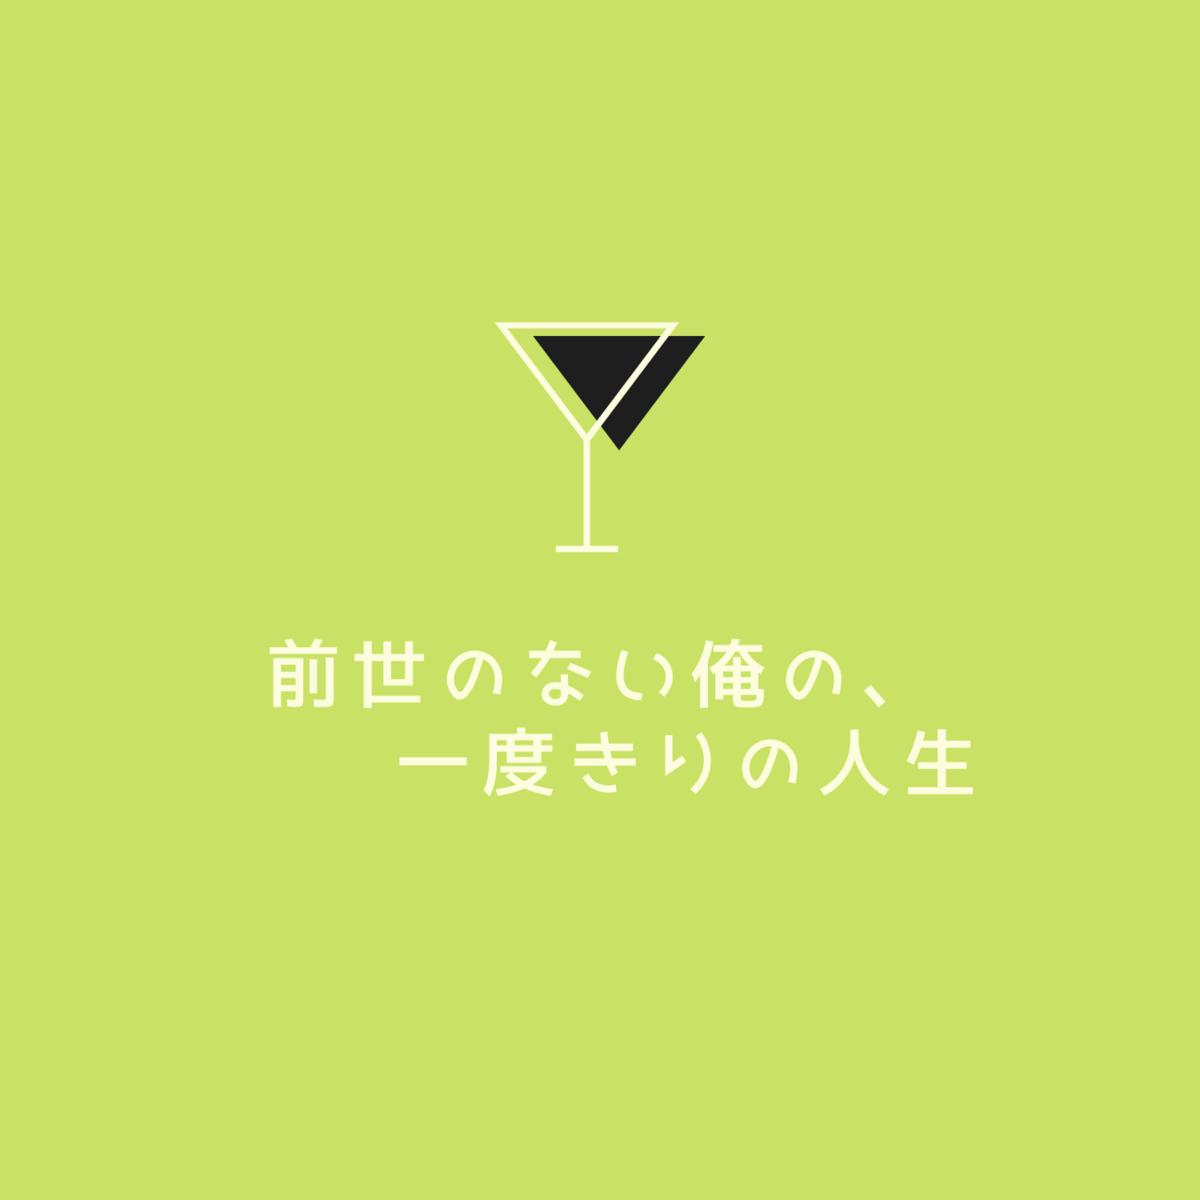 f:id:ookimachi:20210516225058p:plain